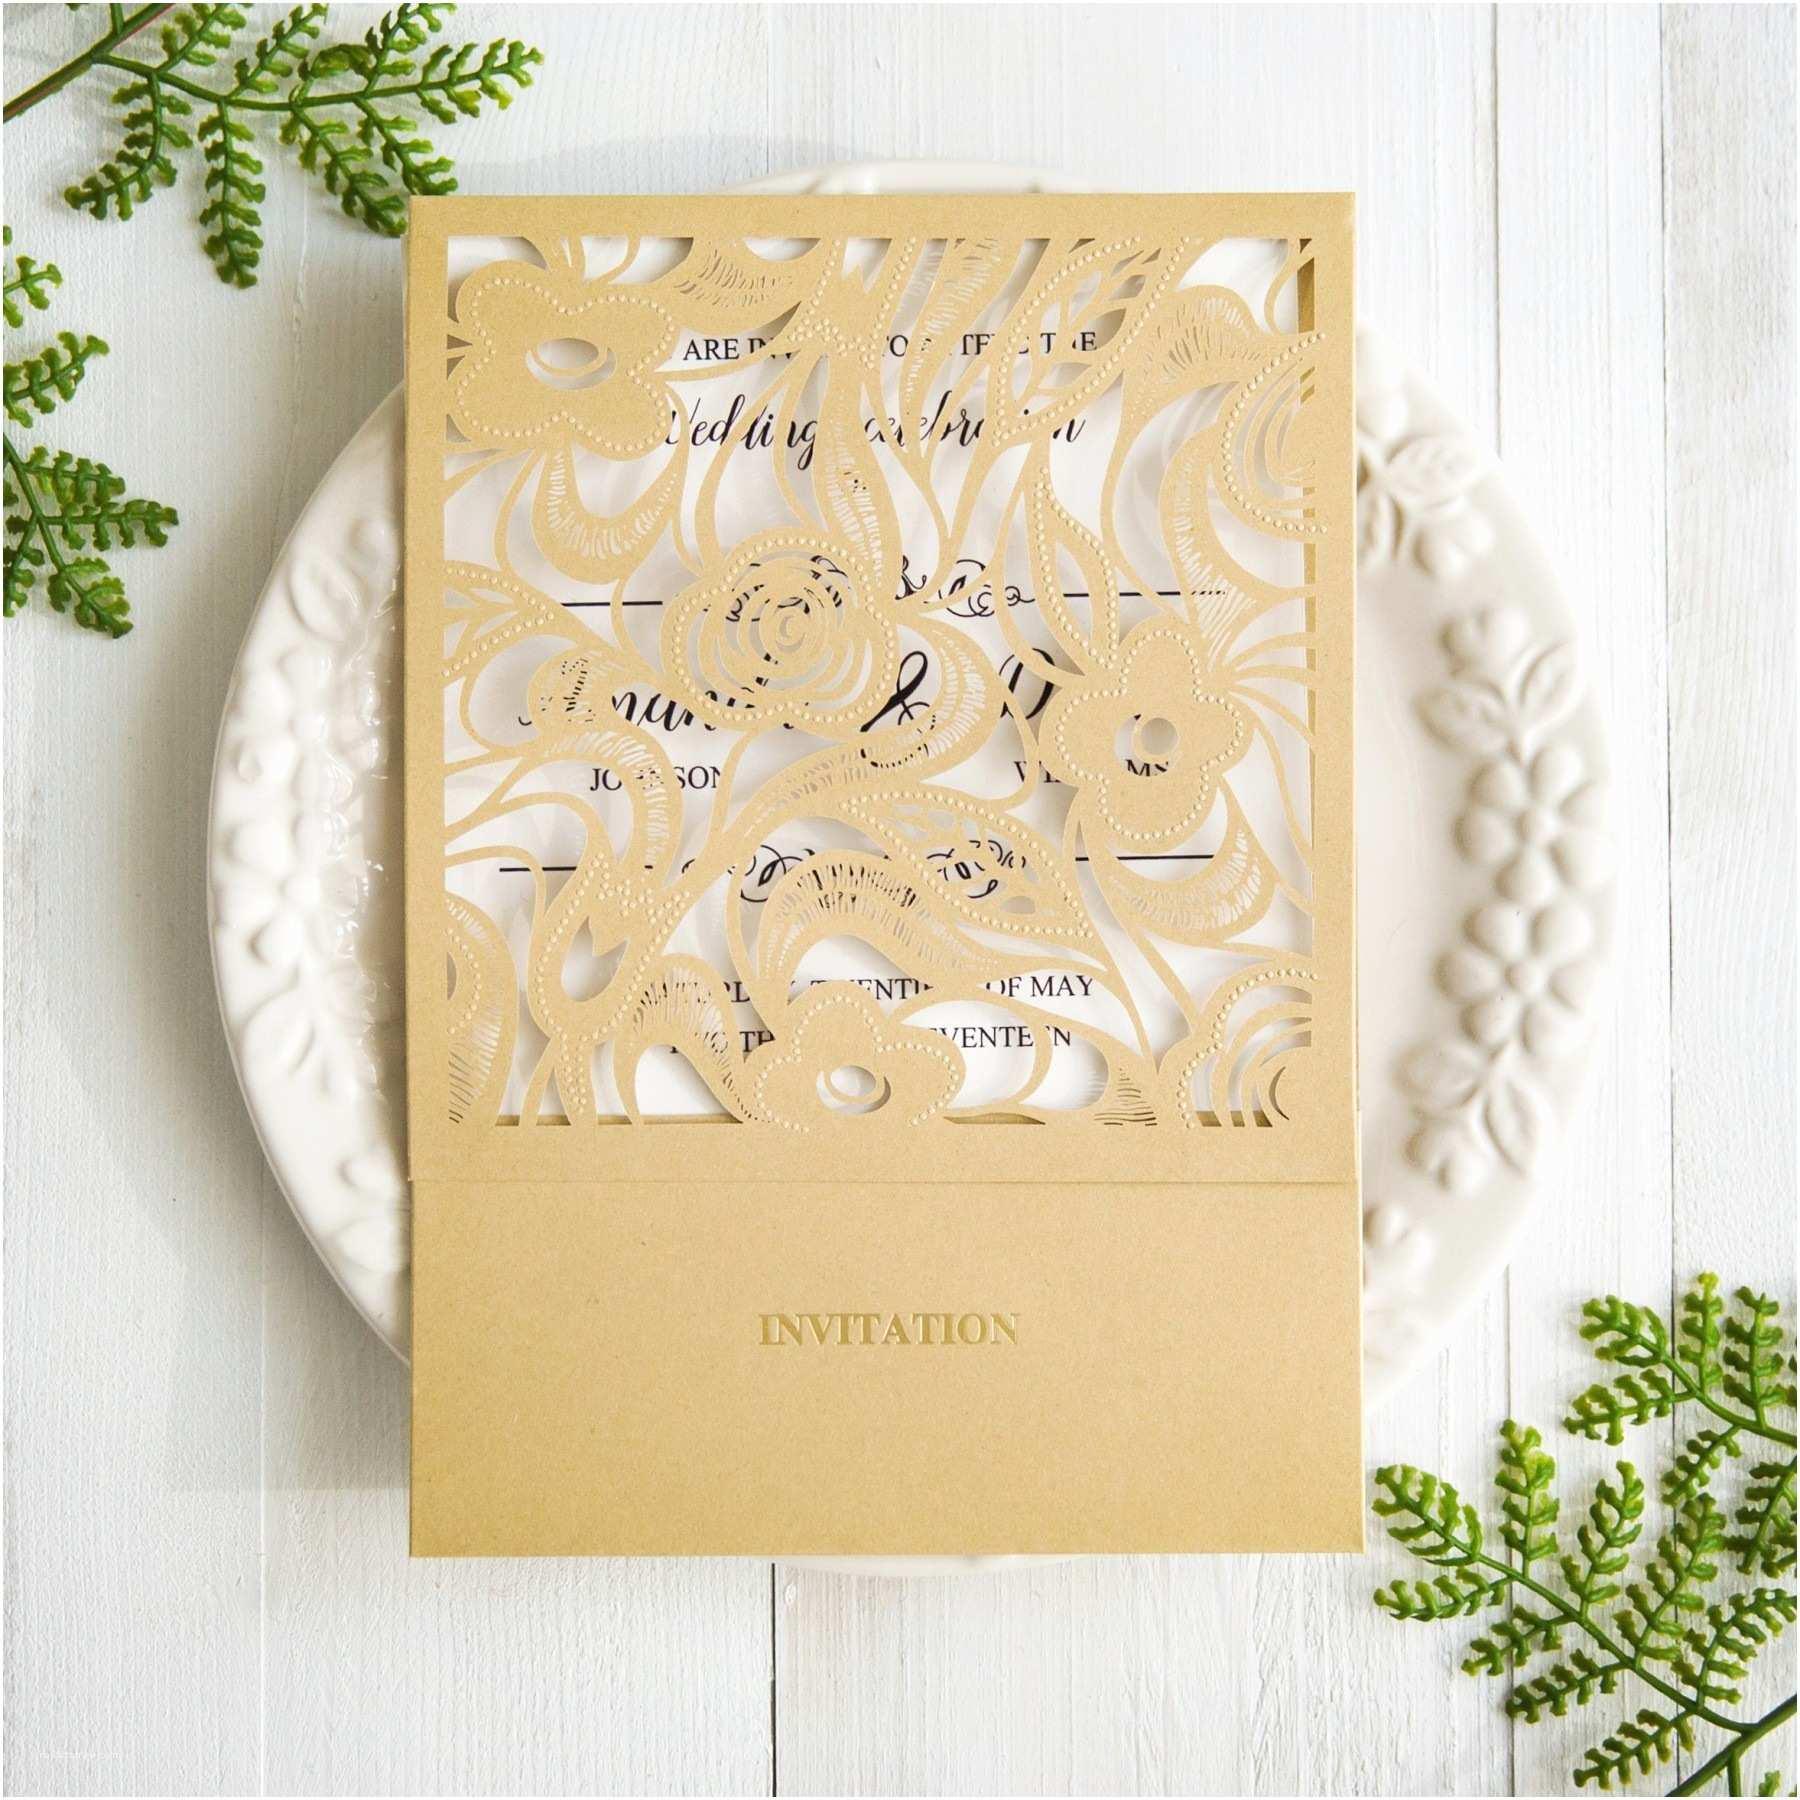 Elegant Pocket Wedding Invitations Elegant Gold Laser Cut Wedding Invitation Cards